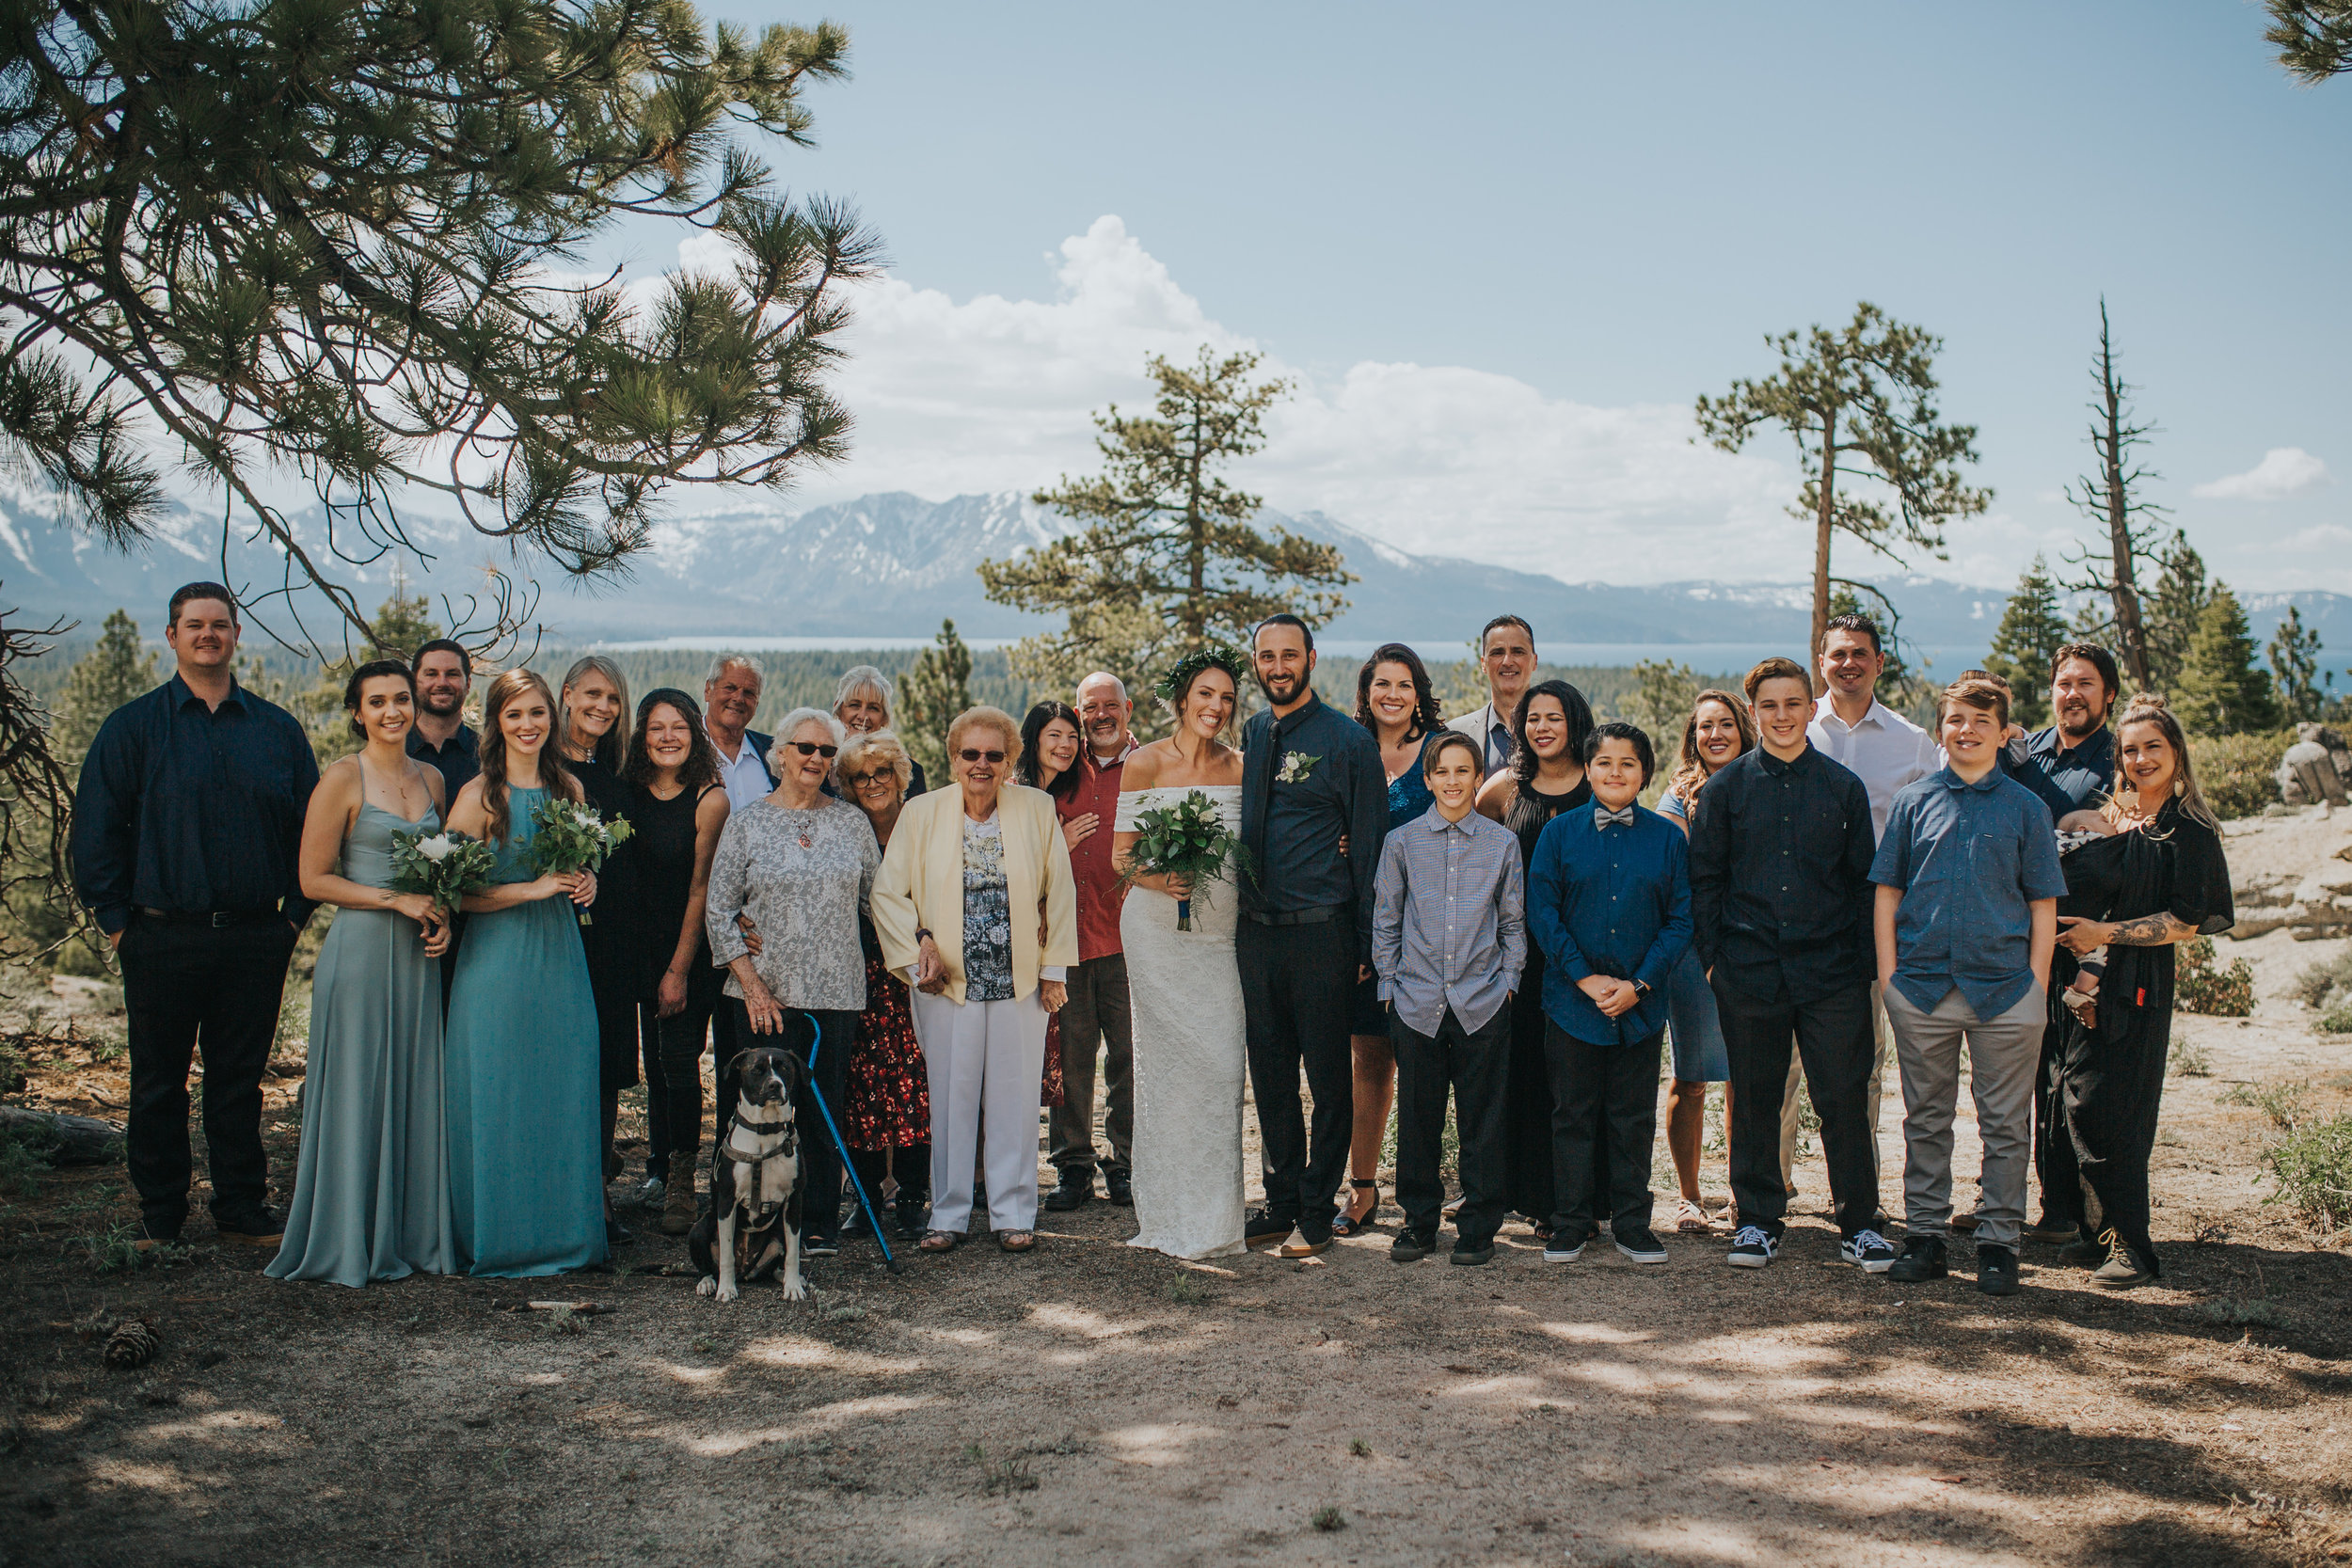 south-lake-tahoe-elopement-valerie-lendvay-photo-035.jpg